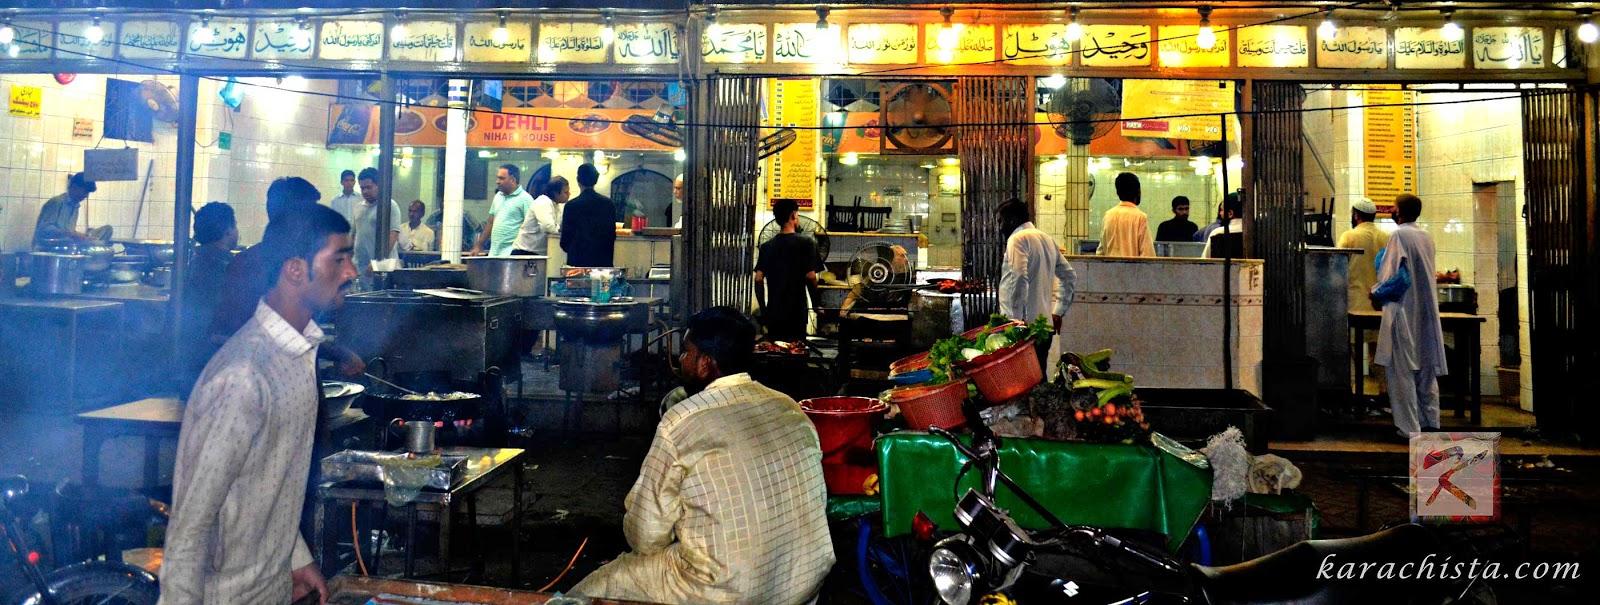 Waheed Kebab House off Burns Road in Karachi